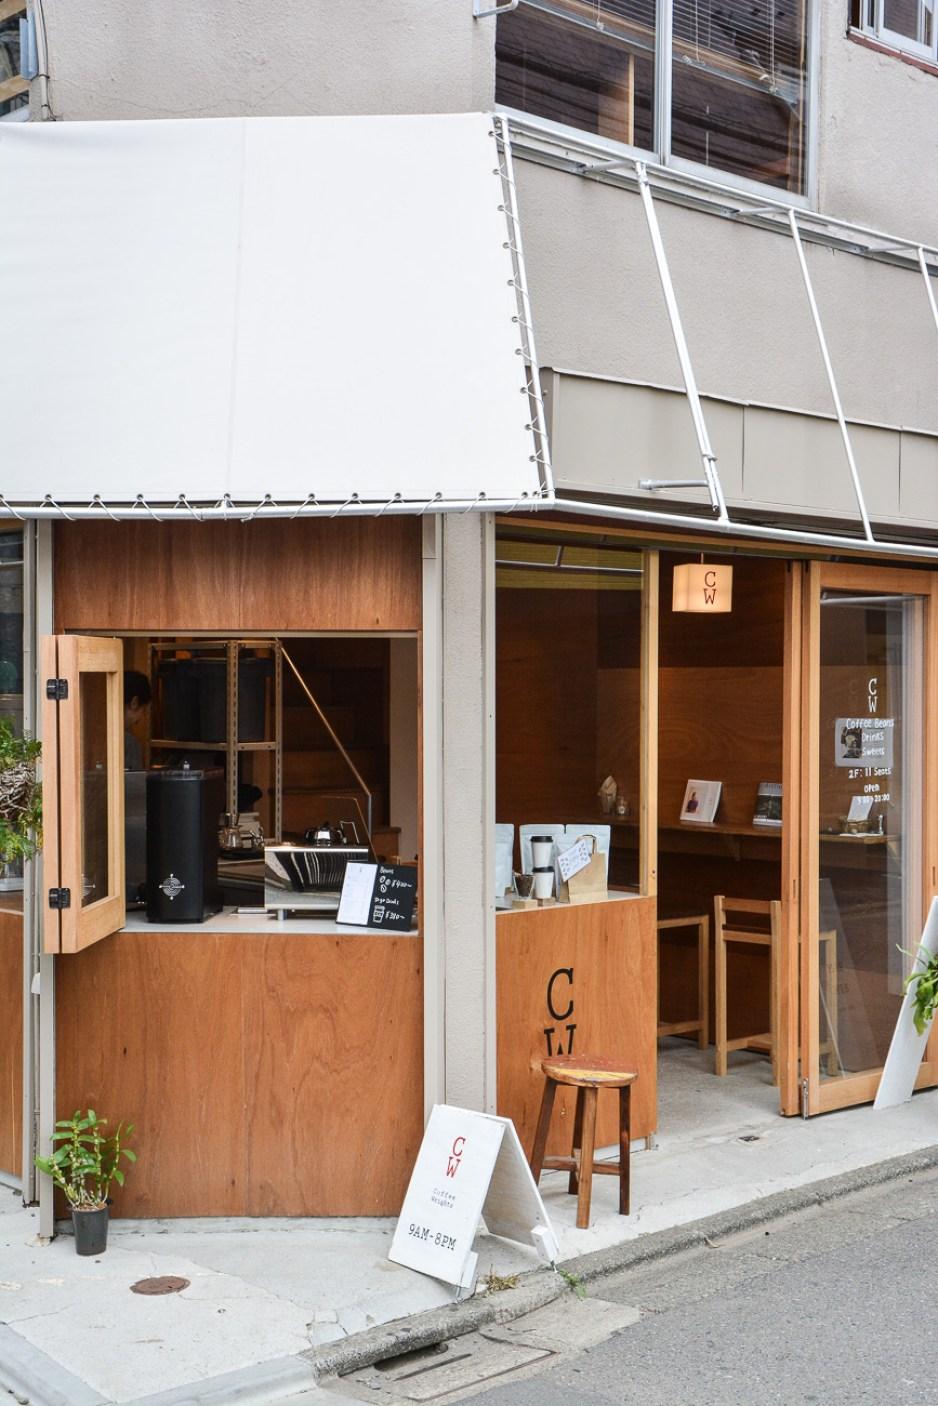 le coffeeshop coffee wrights à tokyo au Japon